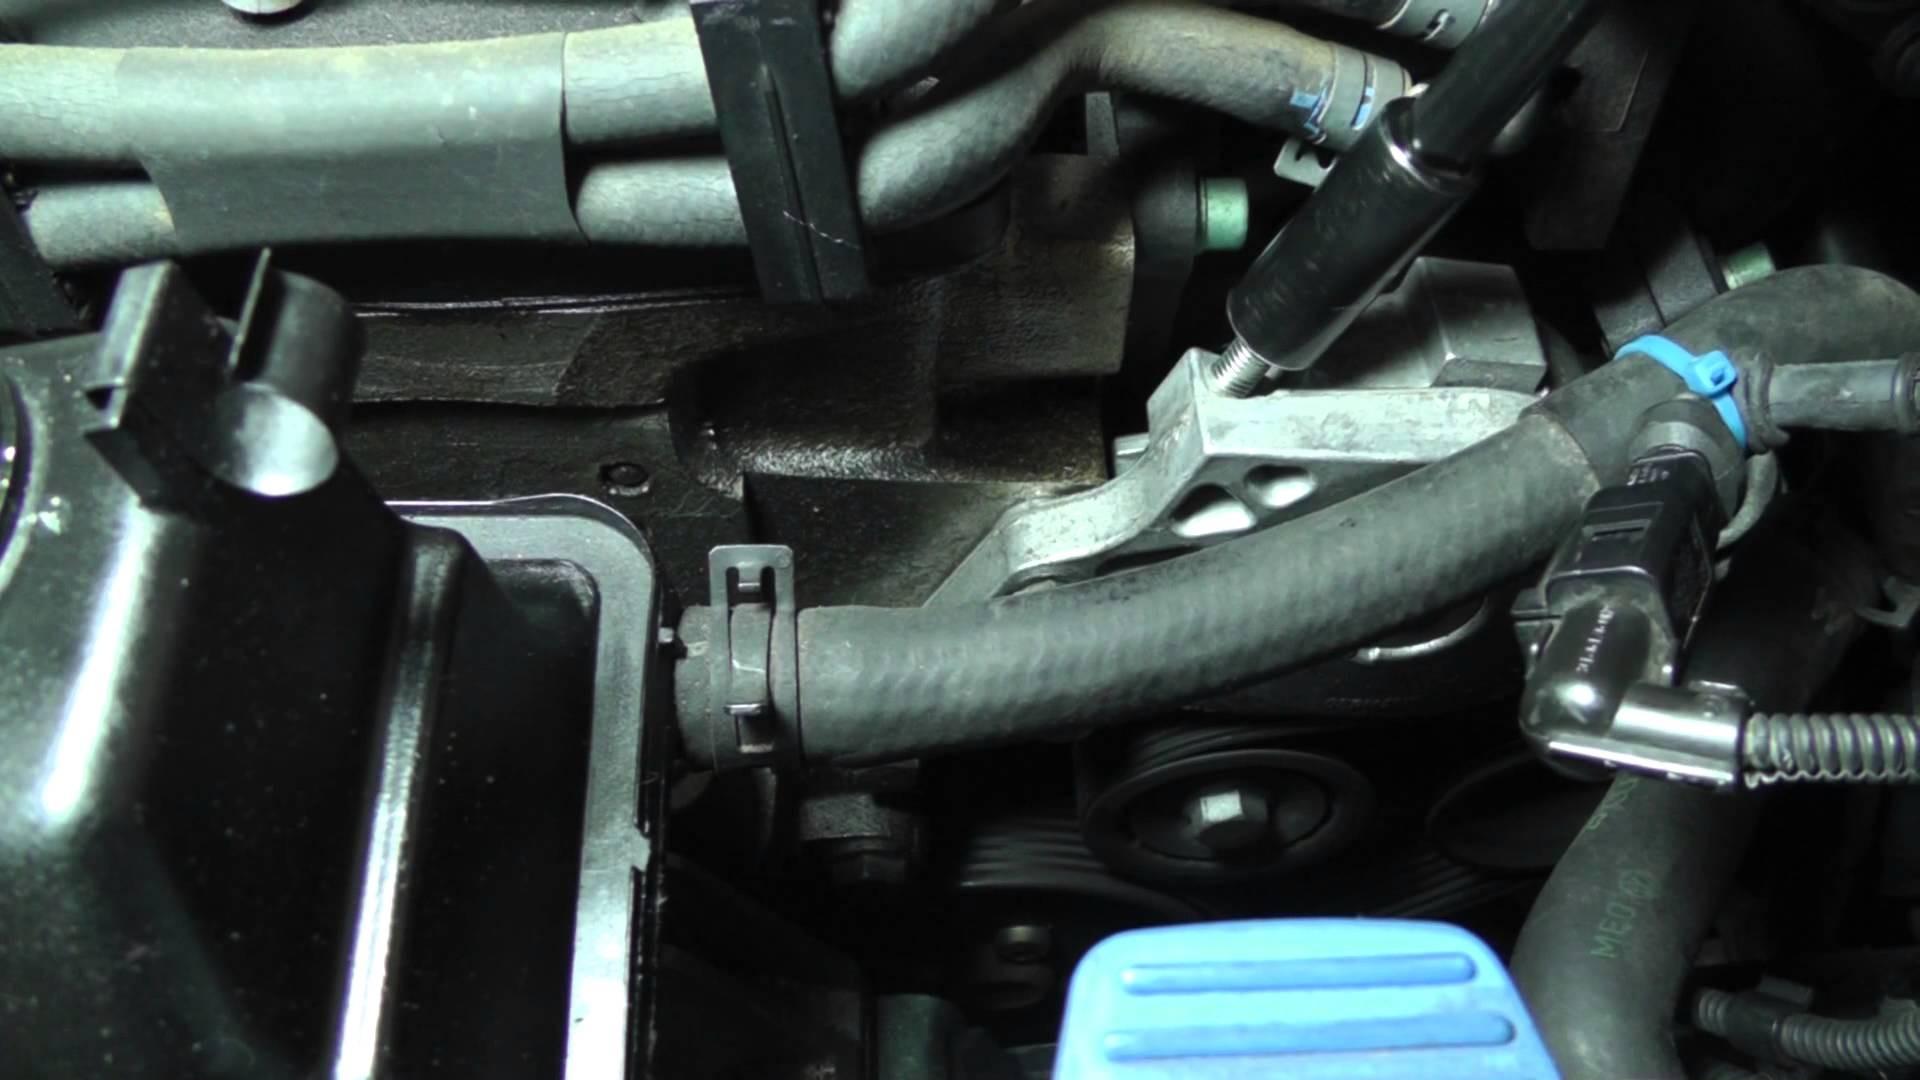 hight resolution of 2003 vw jetta 2 0 engine diagram volkswagen jetta removing power steering pump part 1